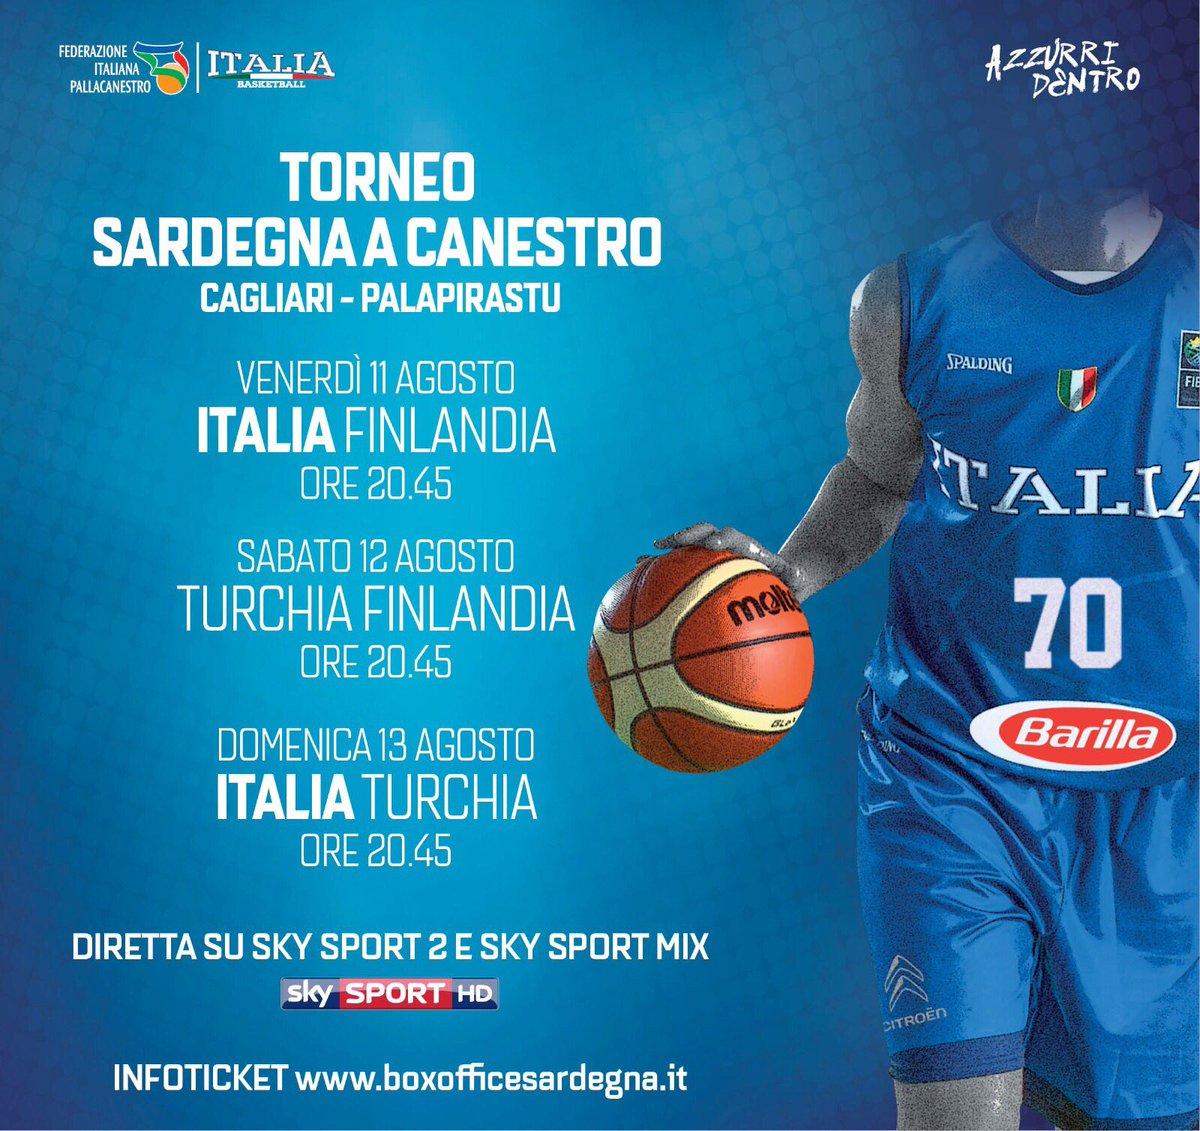 Italbasket Calendario.Italbasket On Twitter Sardegna A Canestro Calendario